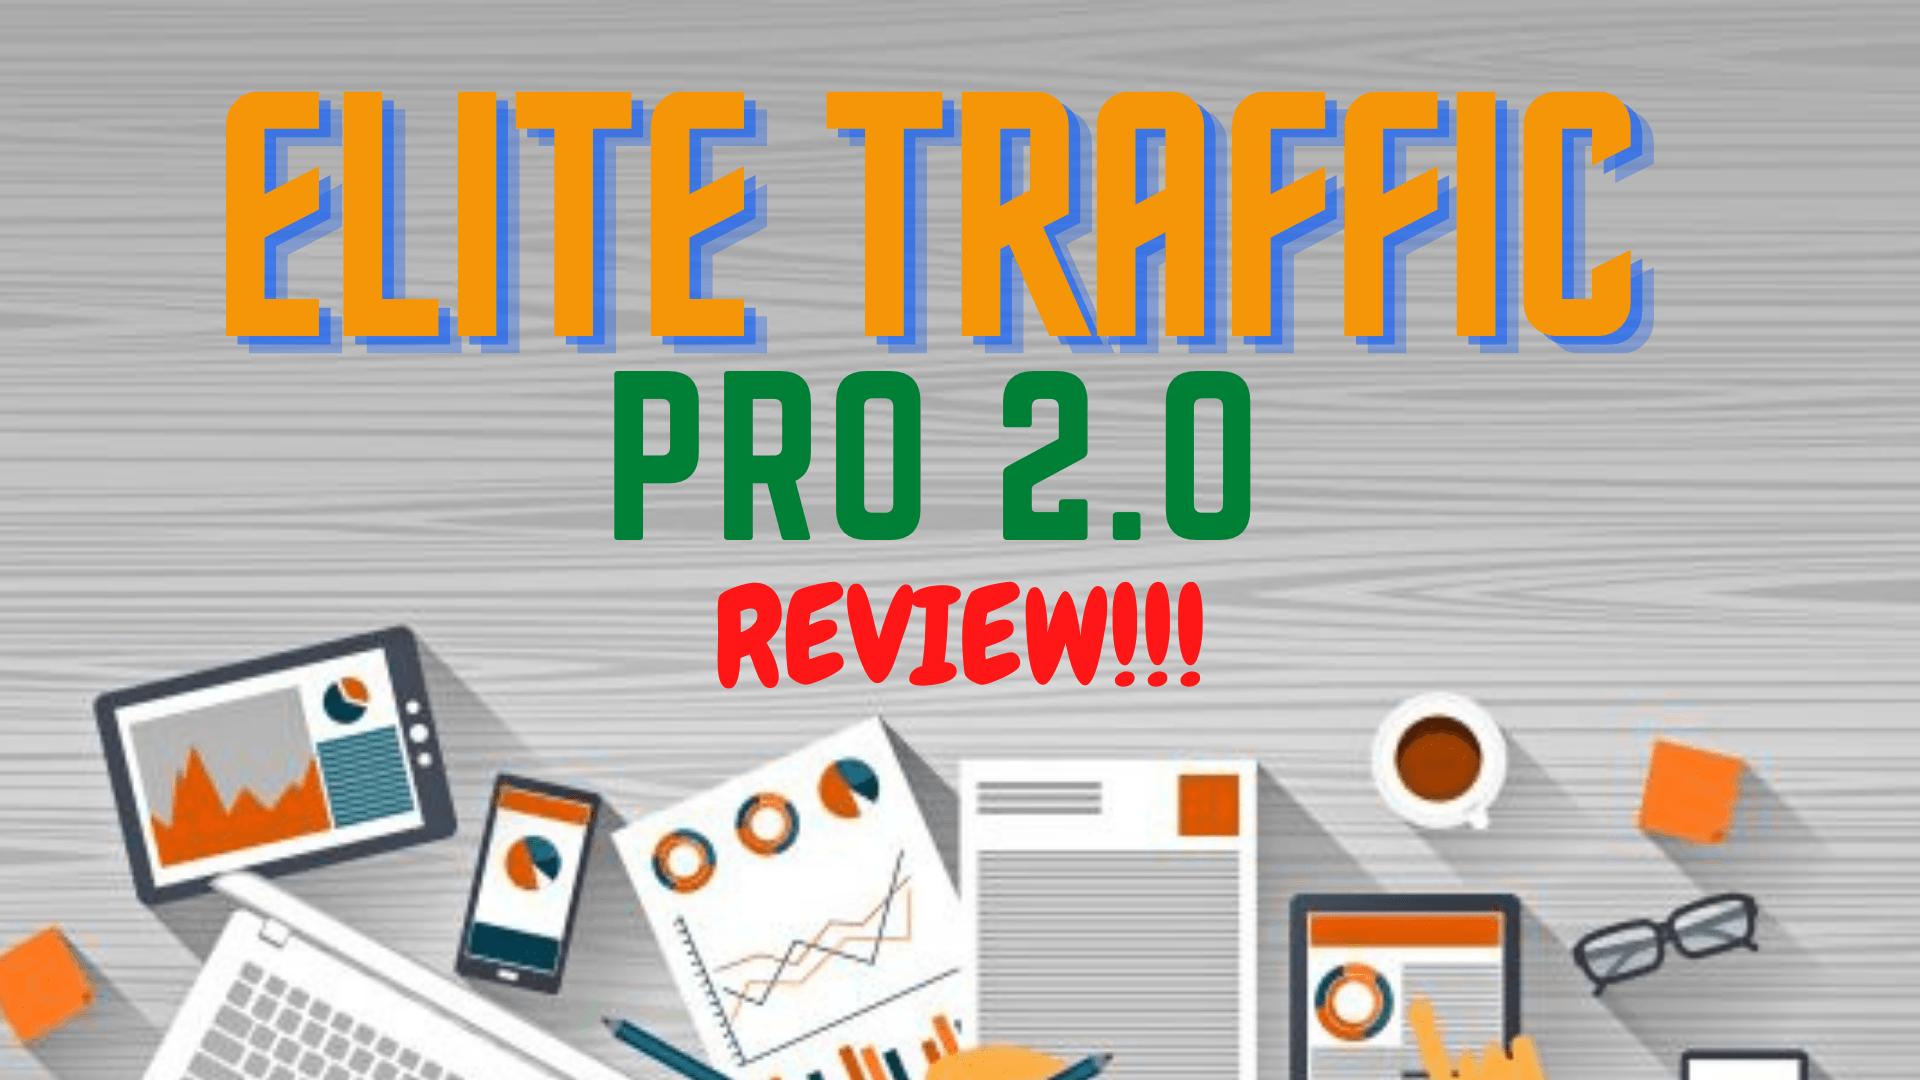 Elite Traffic Pro FRONTPAGE